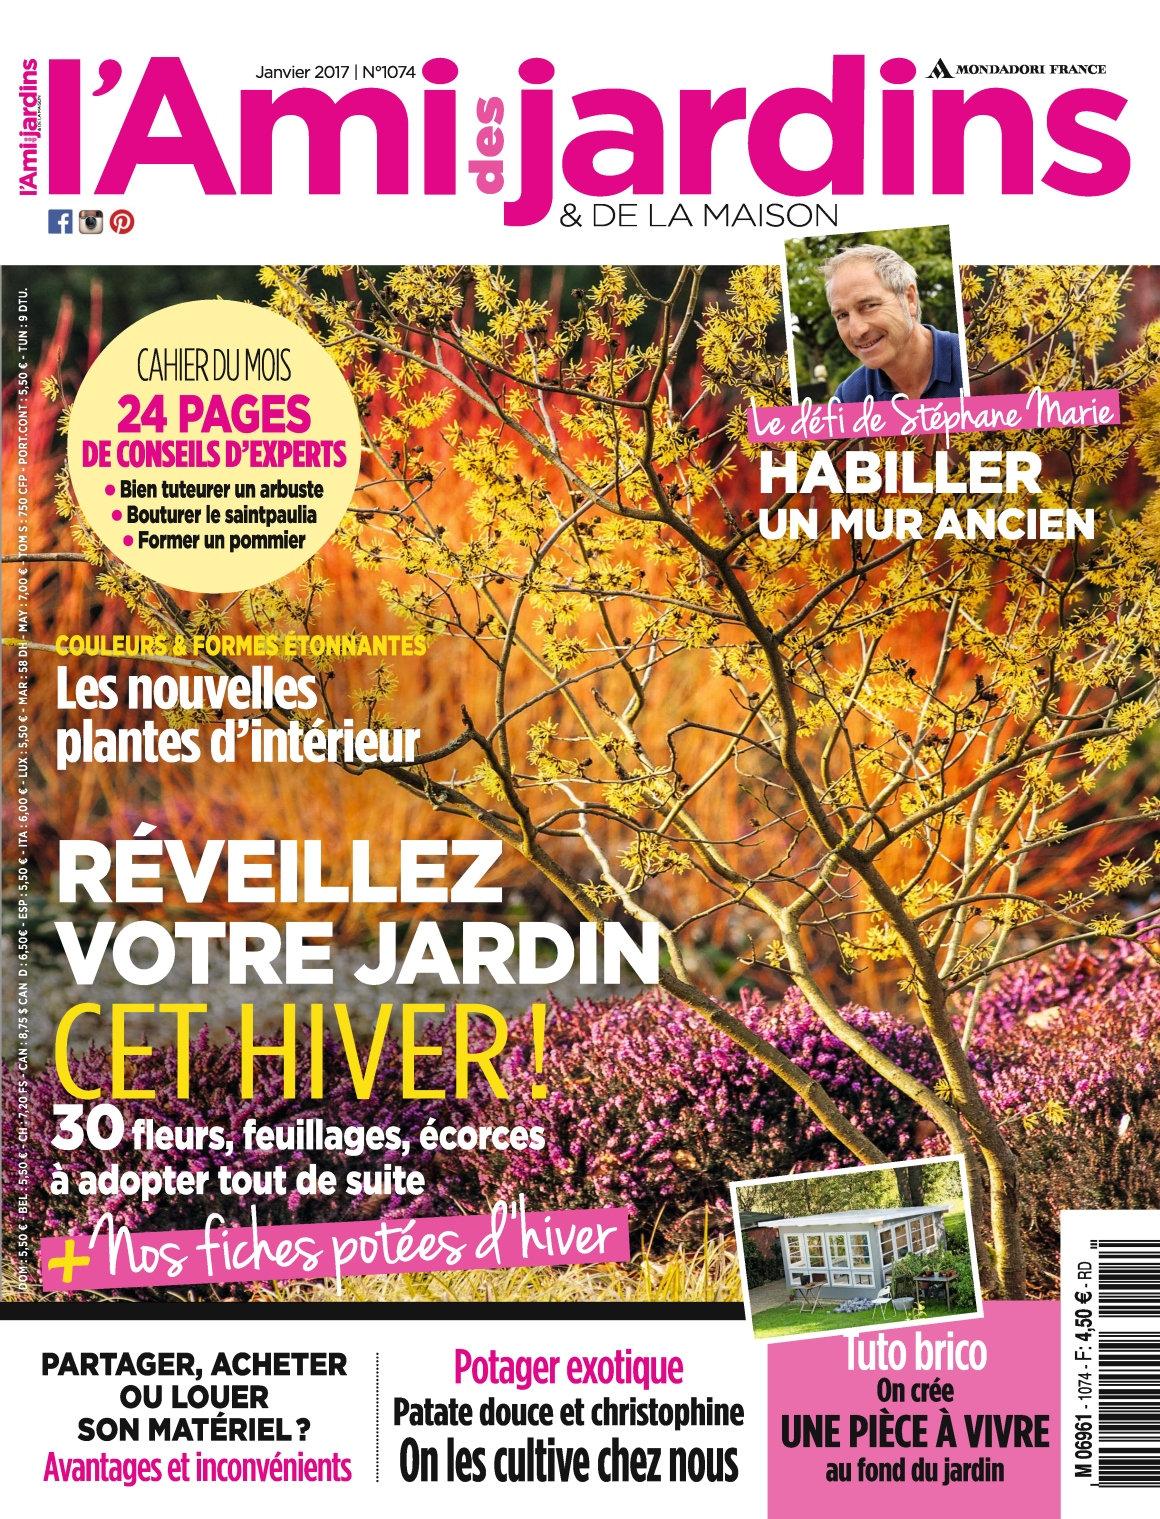 L'Ami des Jardins N°1074 - Janvier 2017